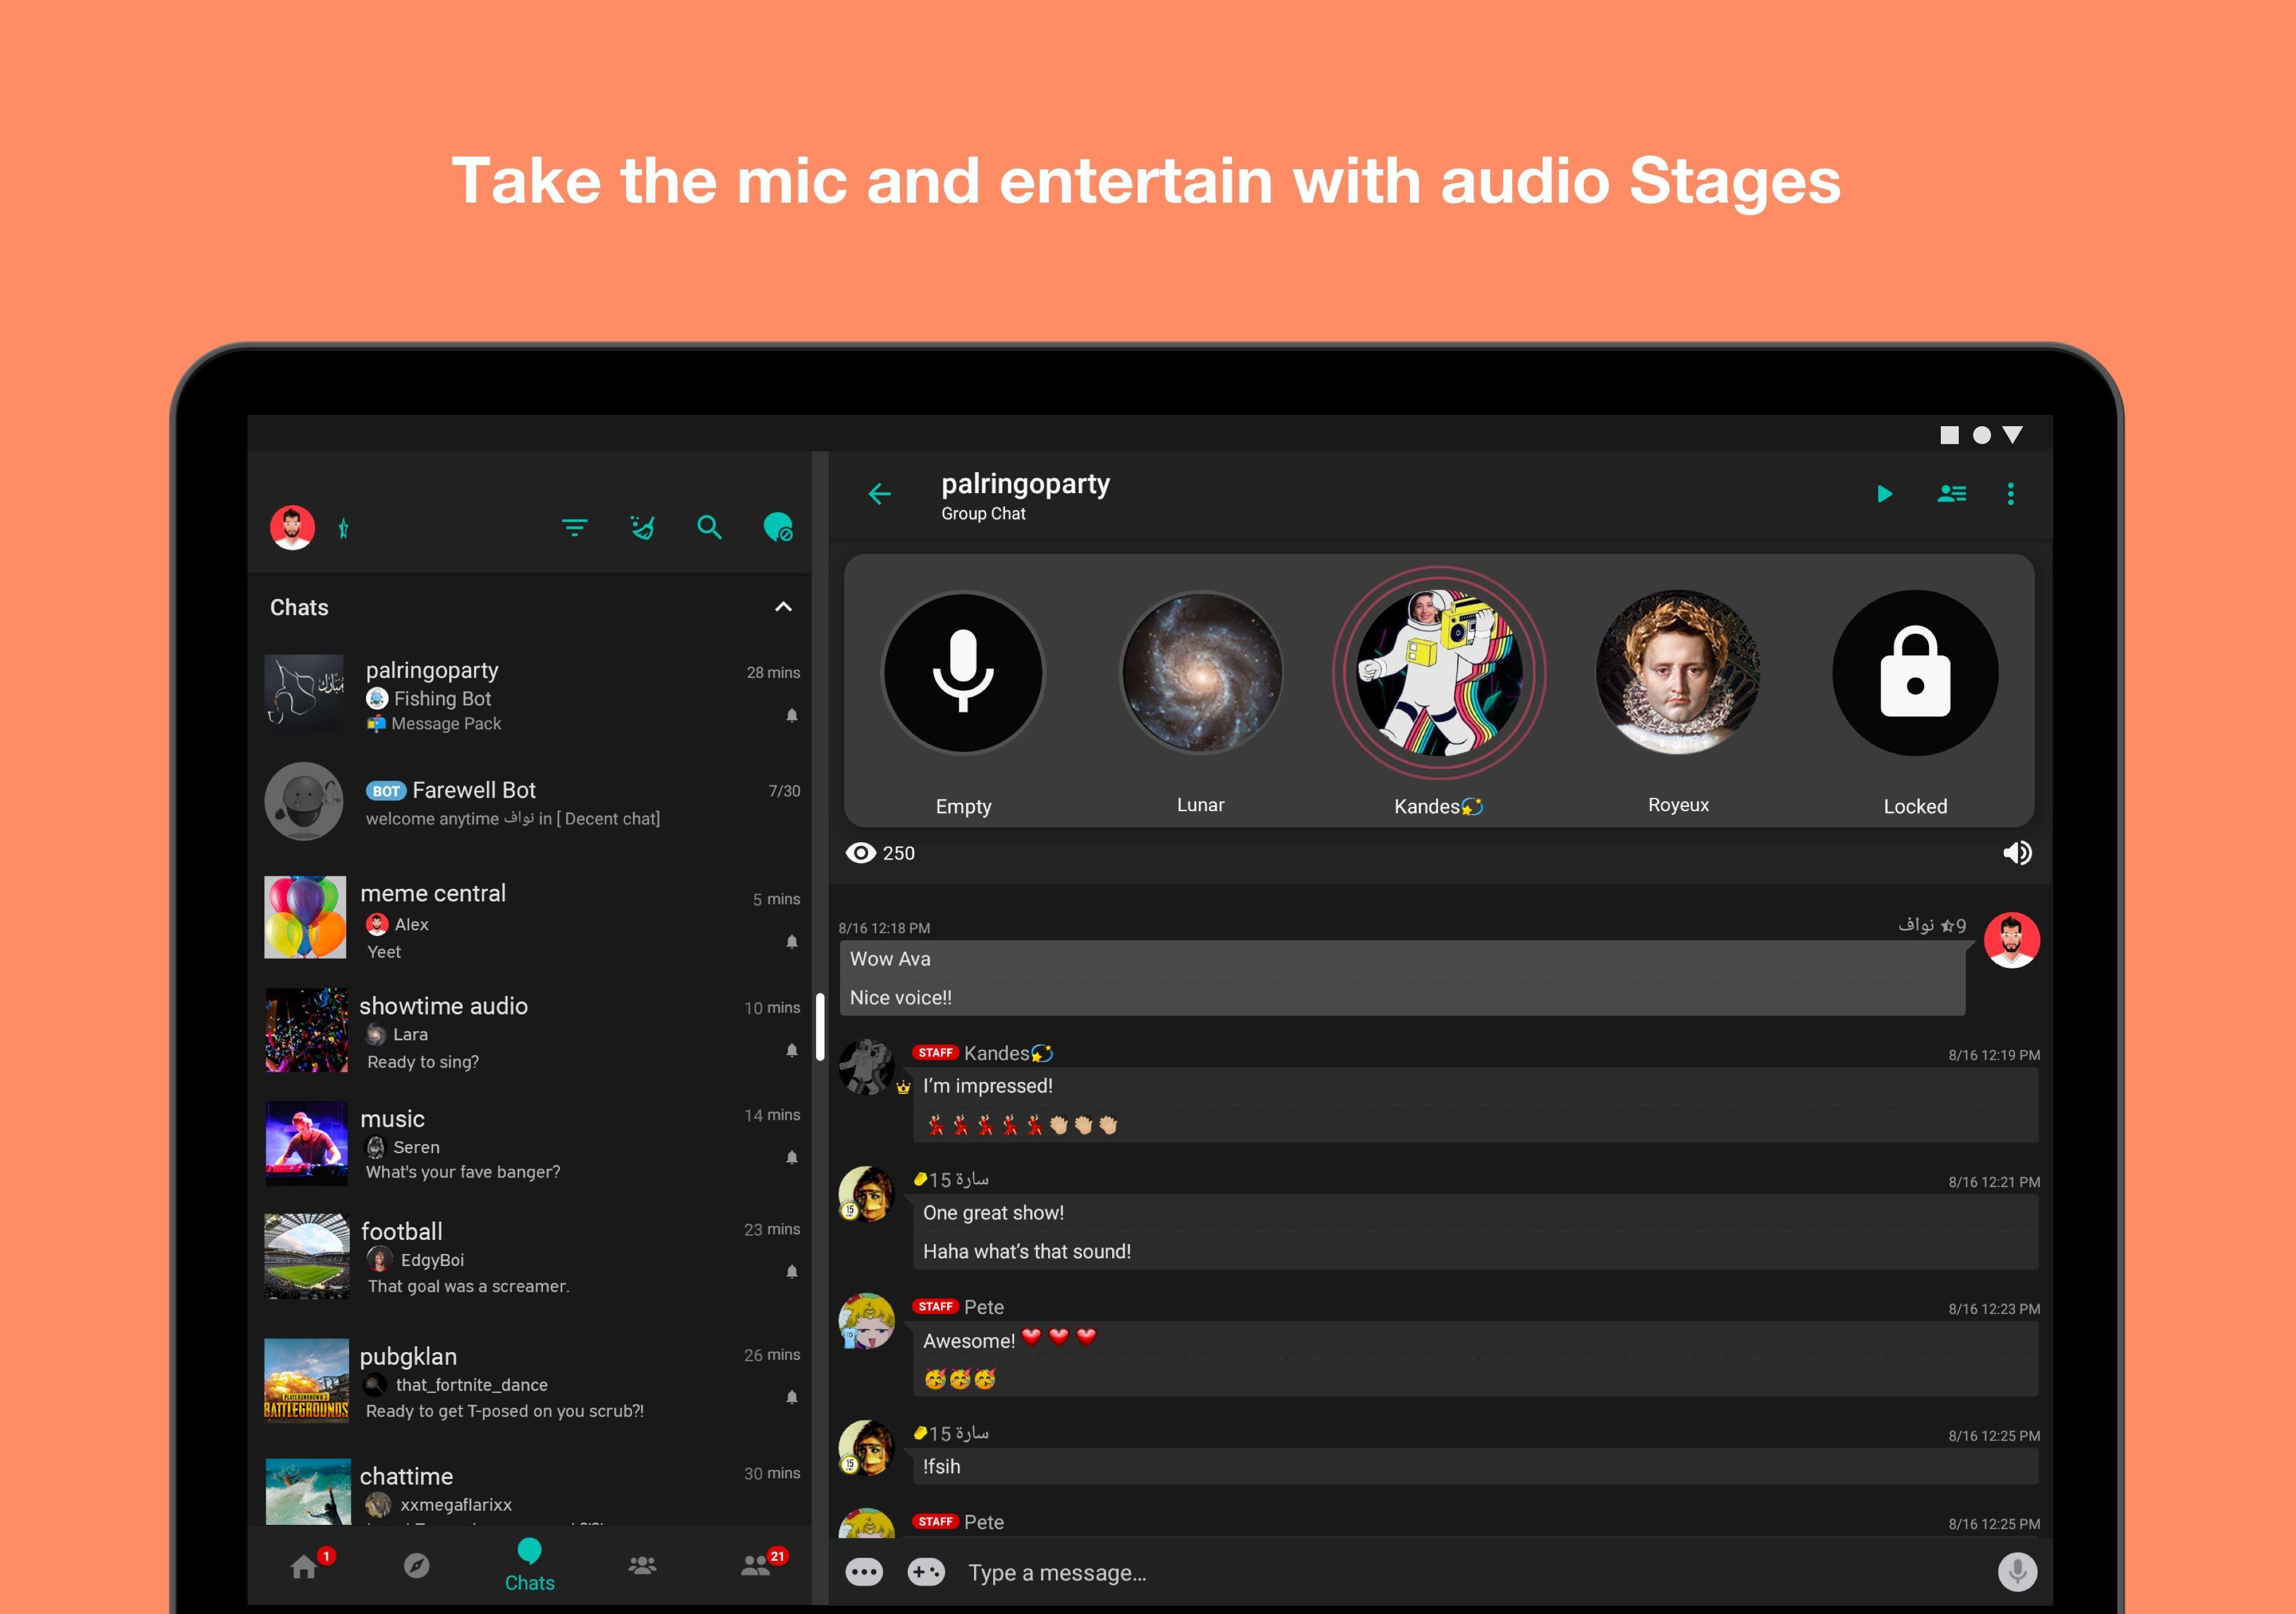 Palringo Group Messenger - chat, play games & more 9.2.1 Screenshot 7